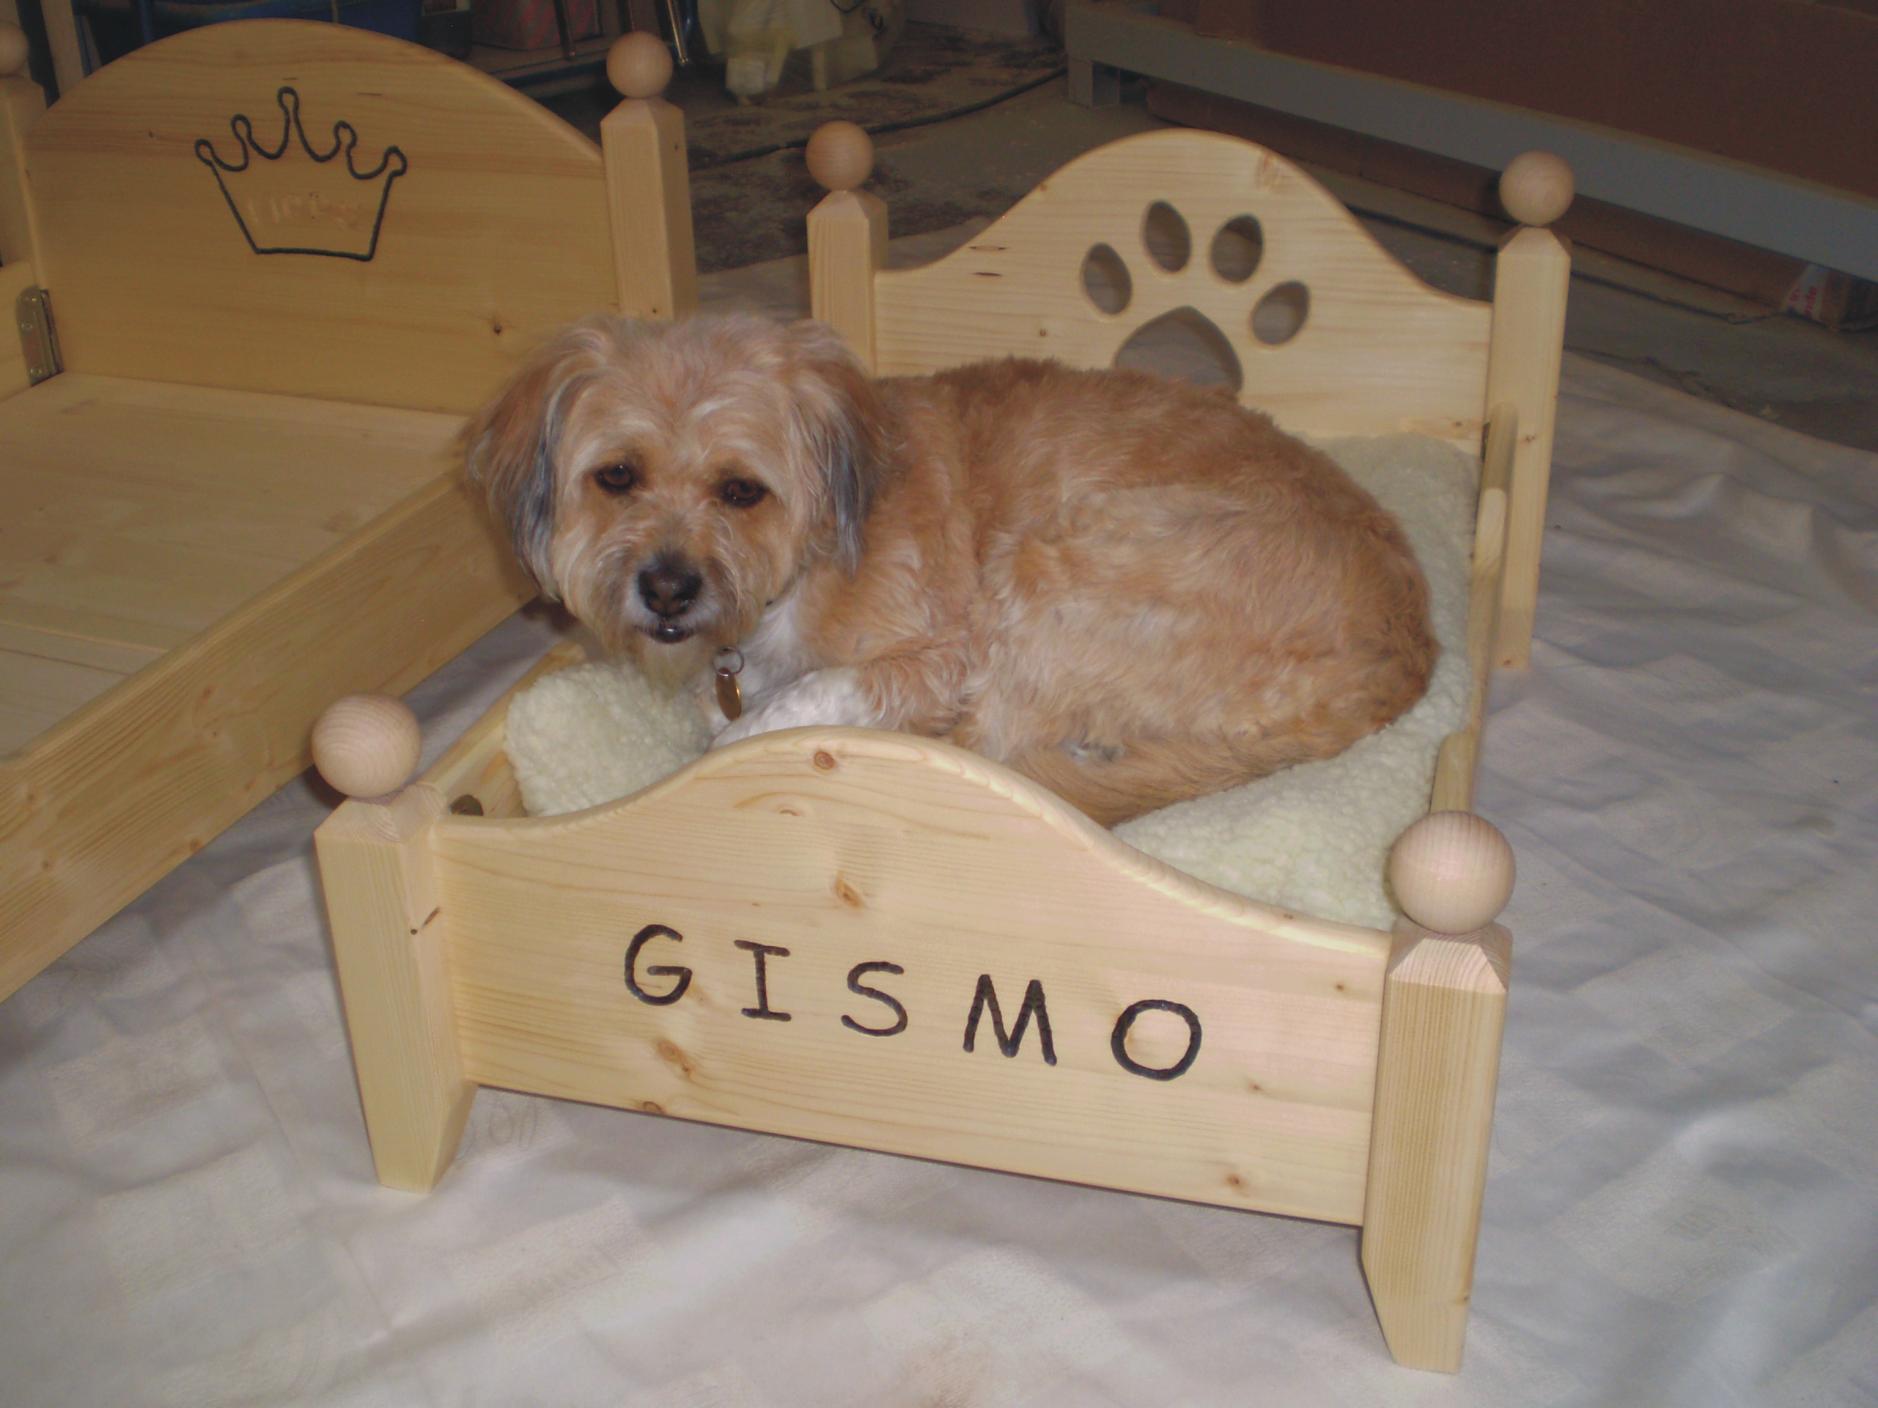 hundebett aus holz hundebett mit polster beige krines home d d heartfelt wooden crate. Black Bedroom Furniture Sets. Home Design Ideas